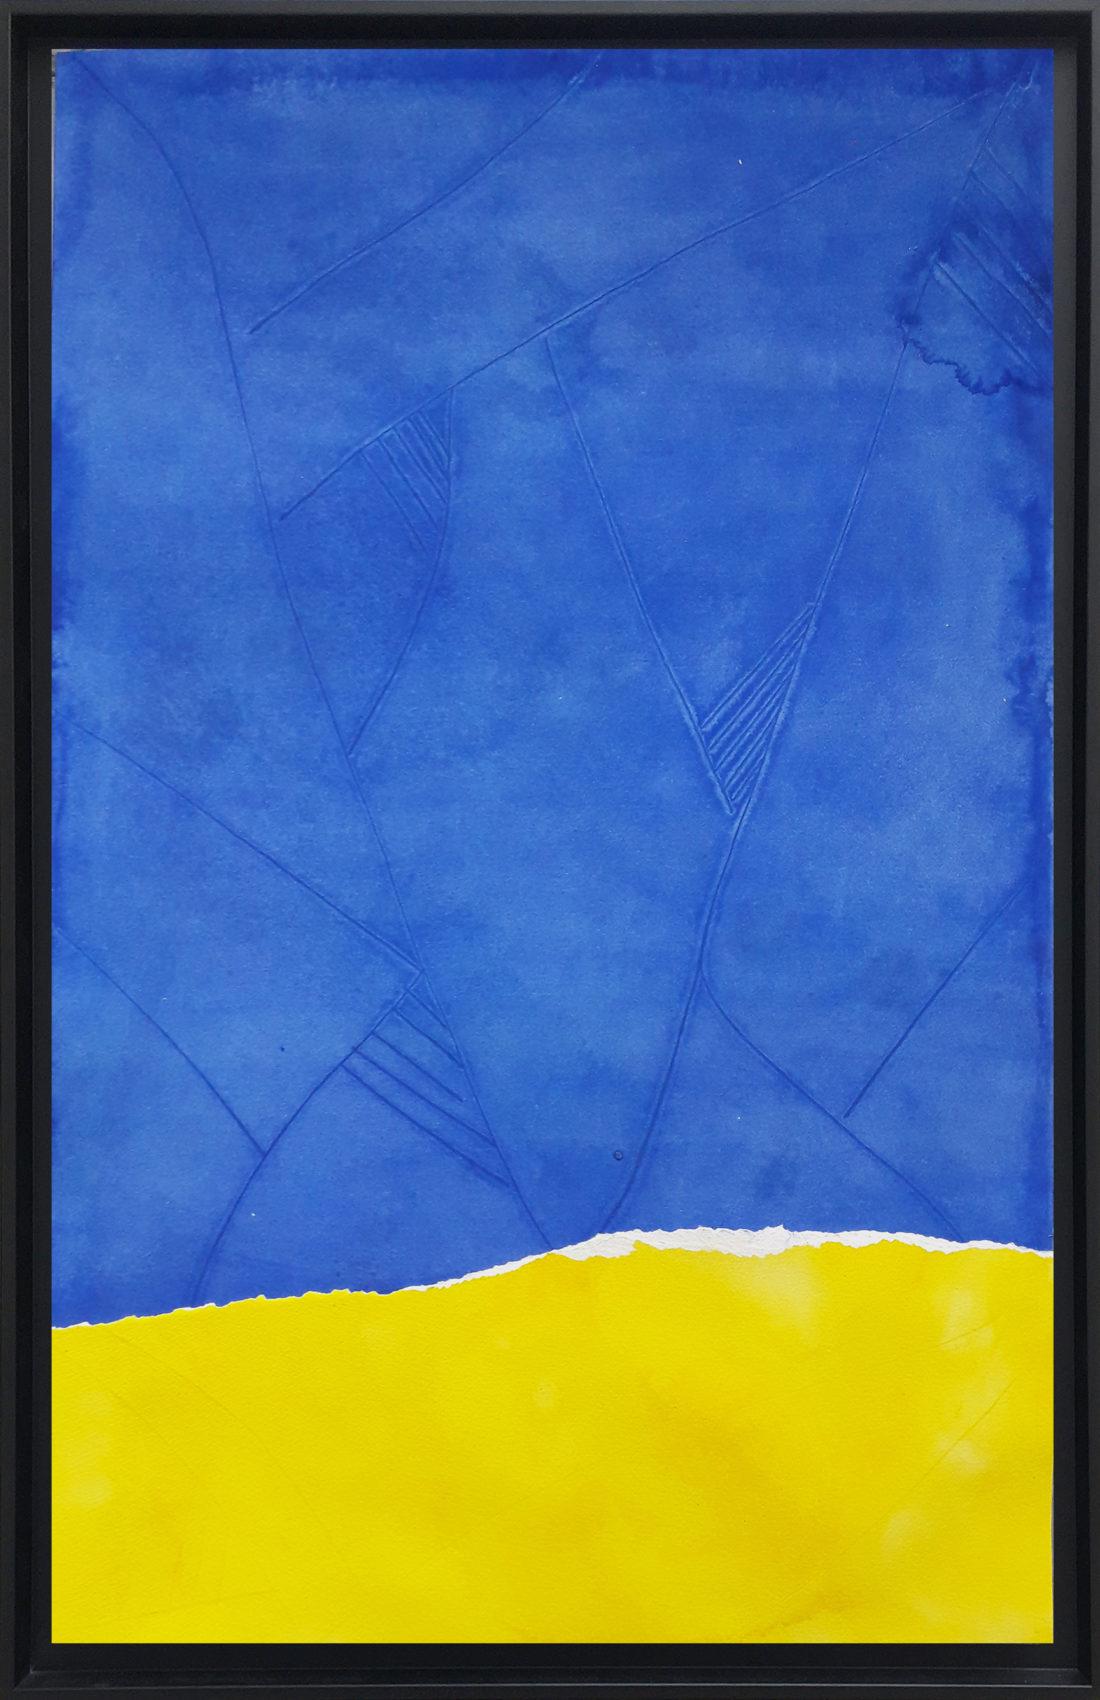 Oeuvre sur papier - Bernard Gortais - Continuum 120